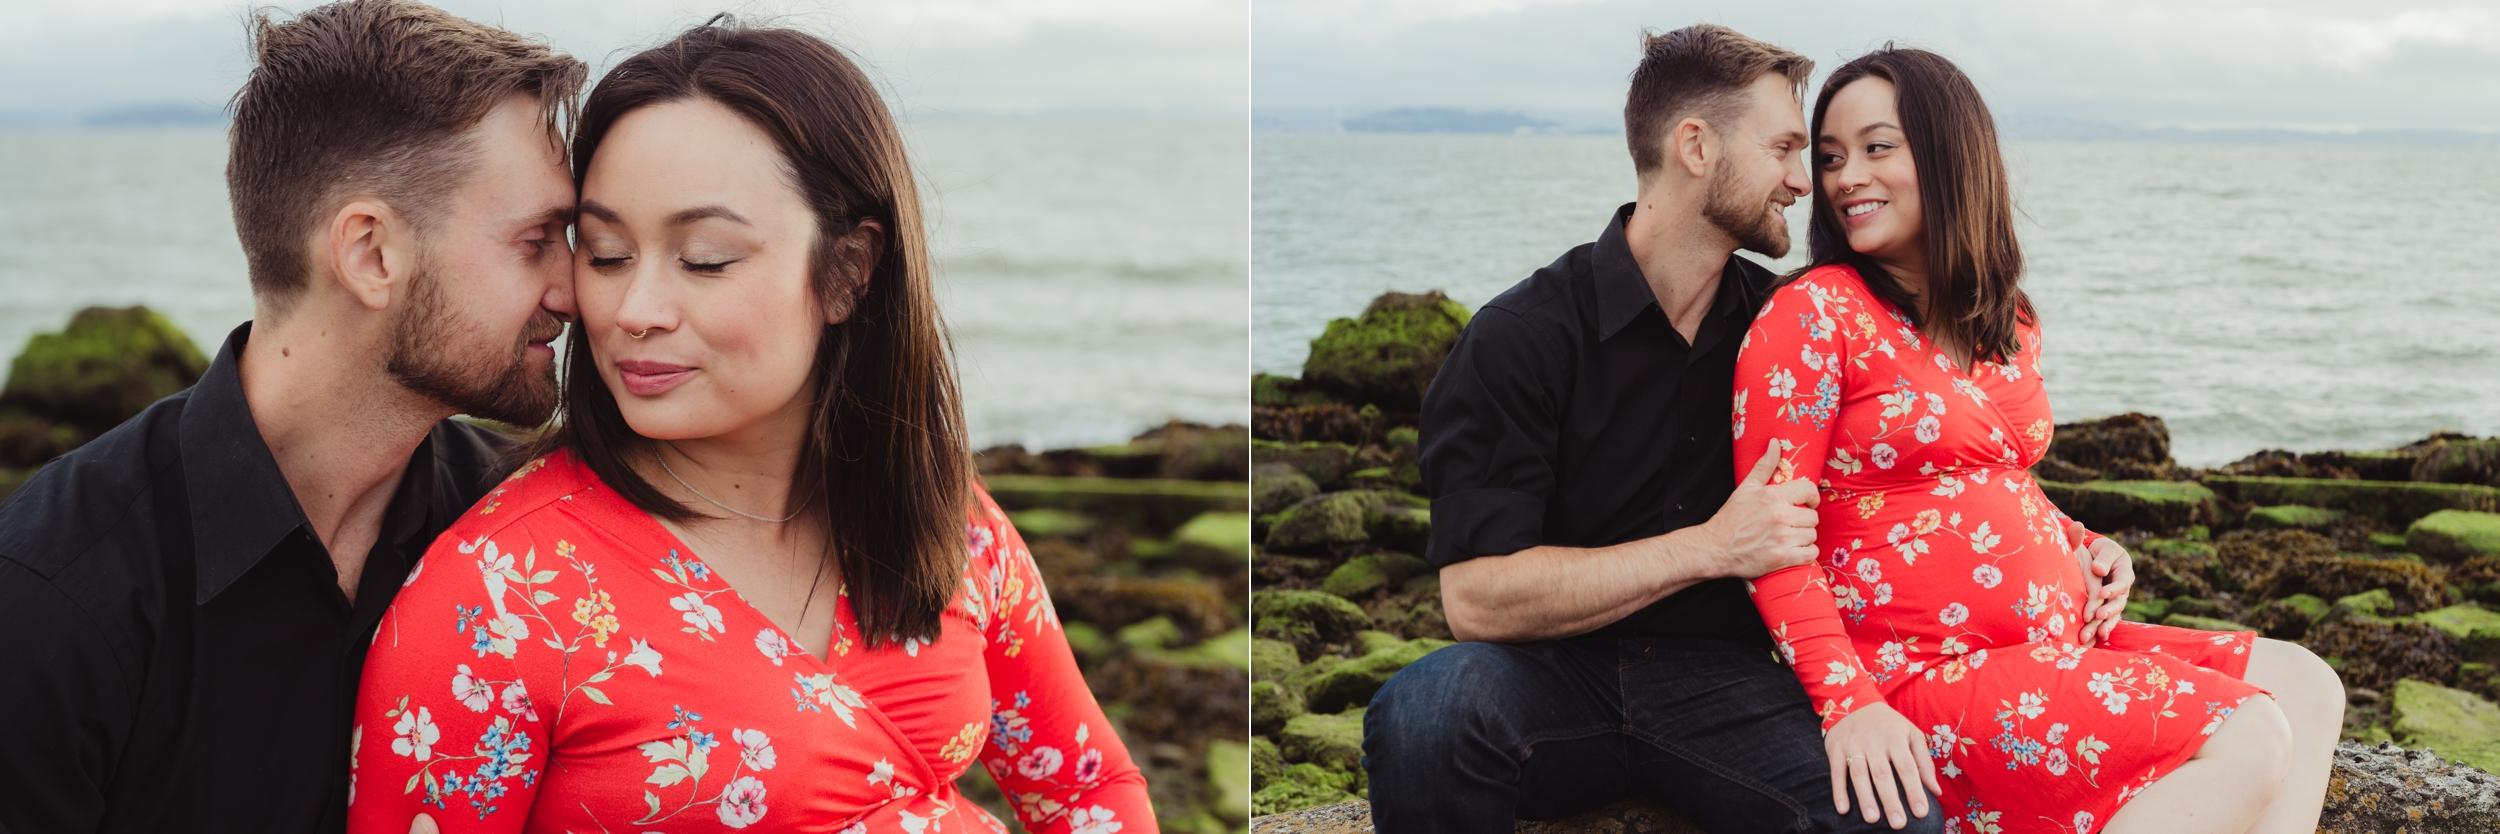 08-albany-bulb-couple-portraits-vivianchen-087_WEB.jpg